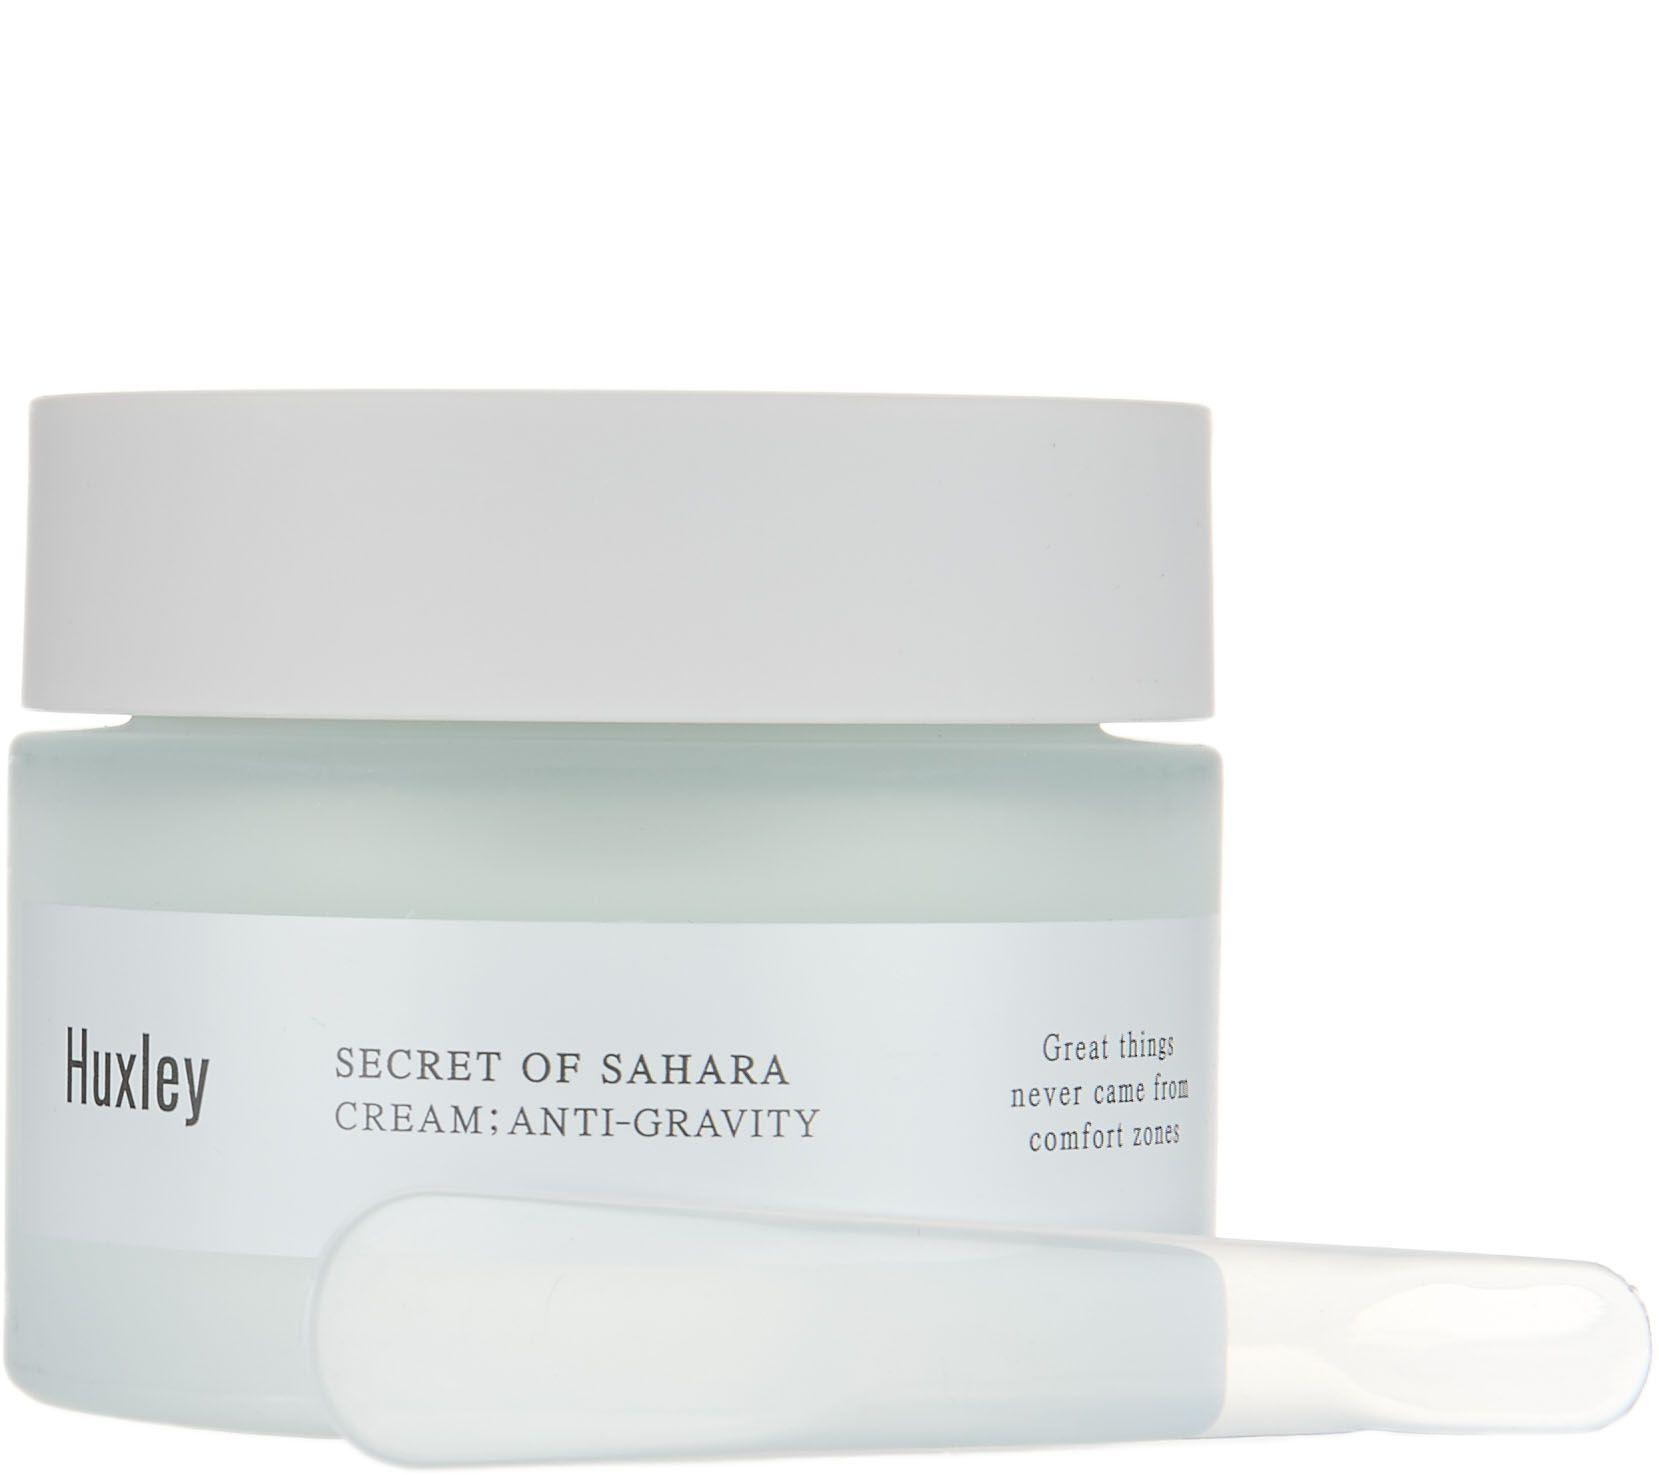 The Anti-Gravity Cream by Huxley #11